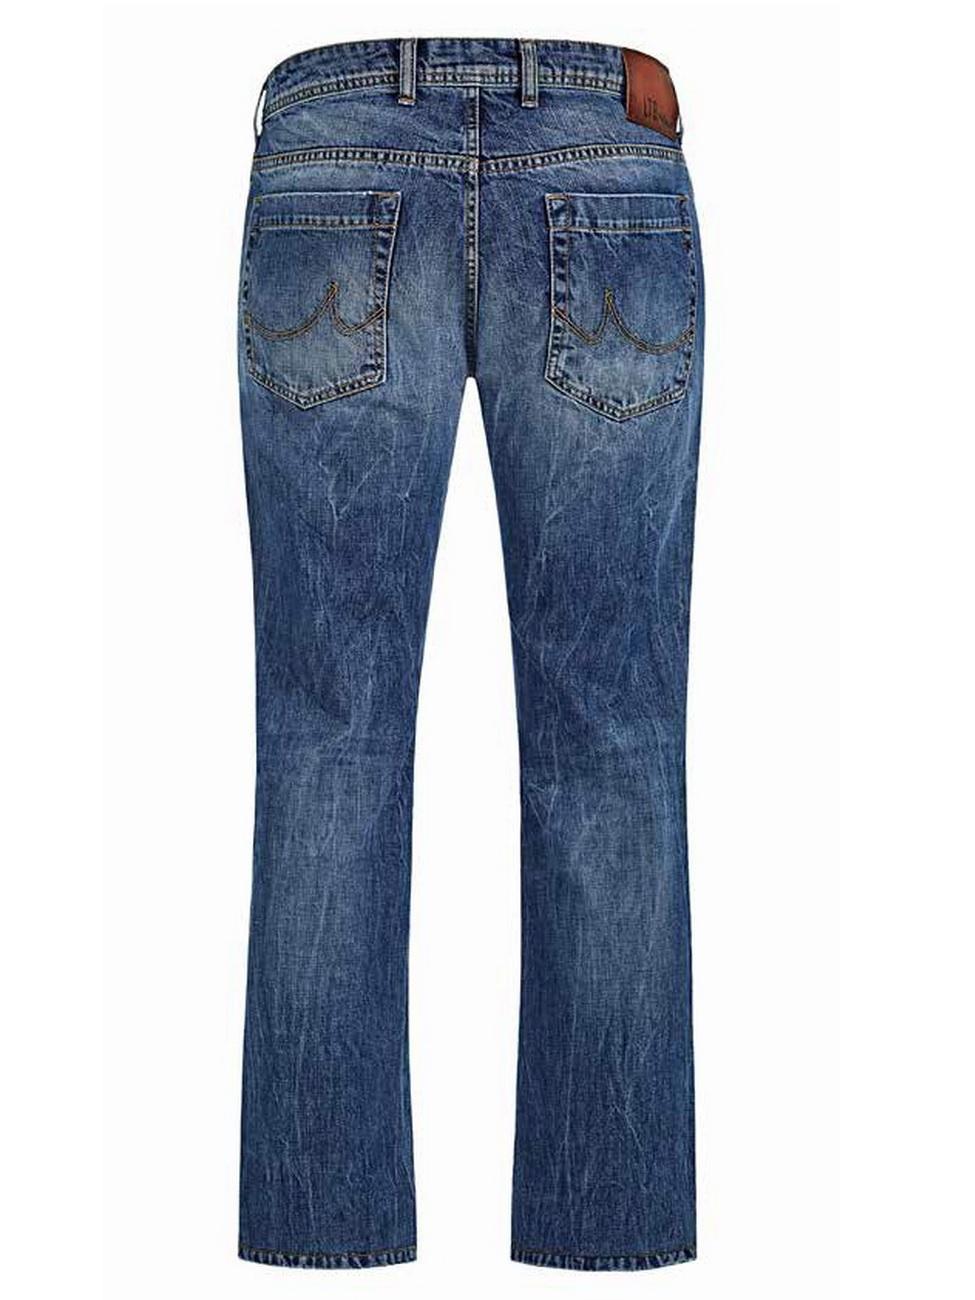 ltb herren jeans paul straight fit blau headow wash kaufen jeans direct de. Black Bedroom Furniture Sets. Home Design Ideas